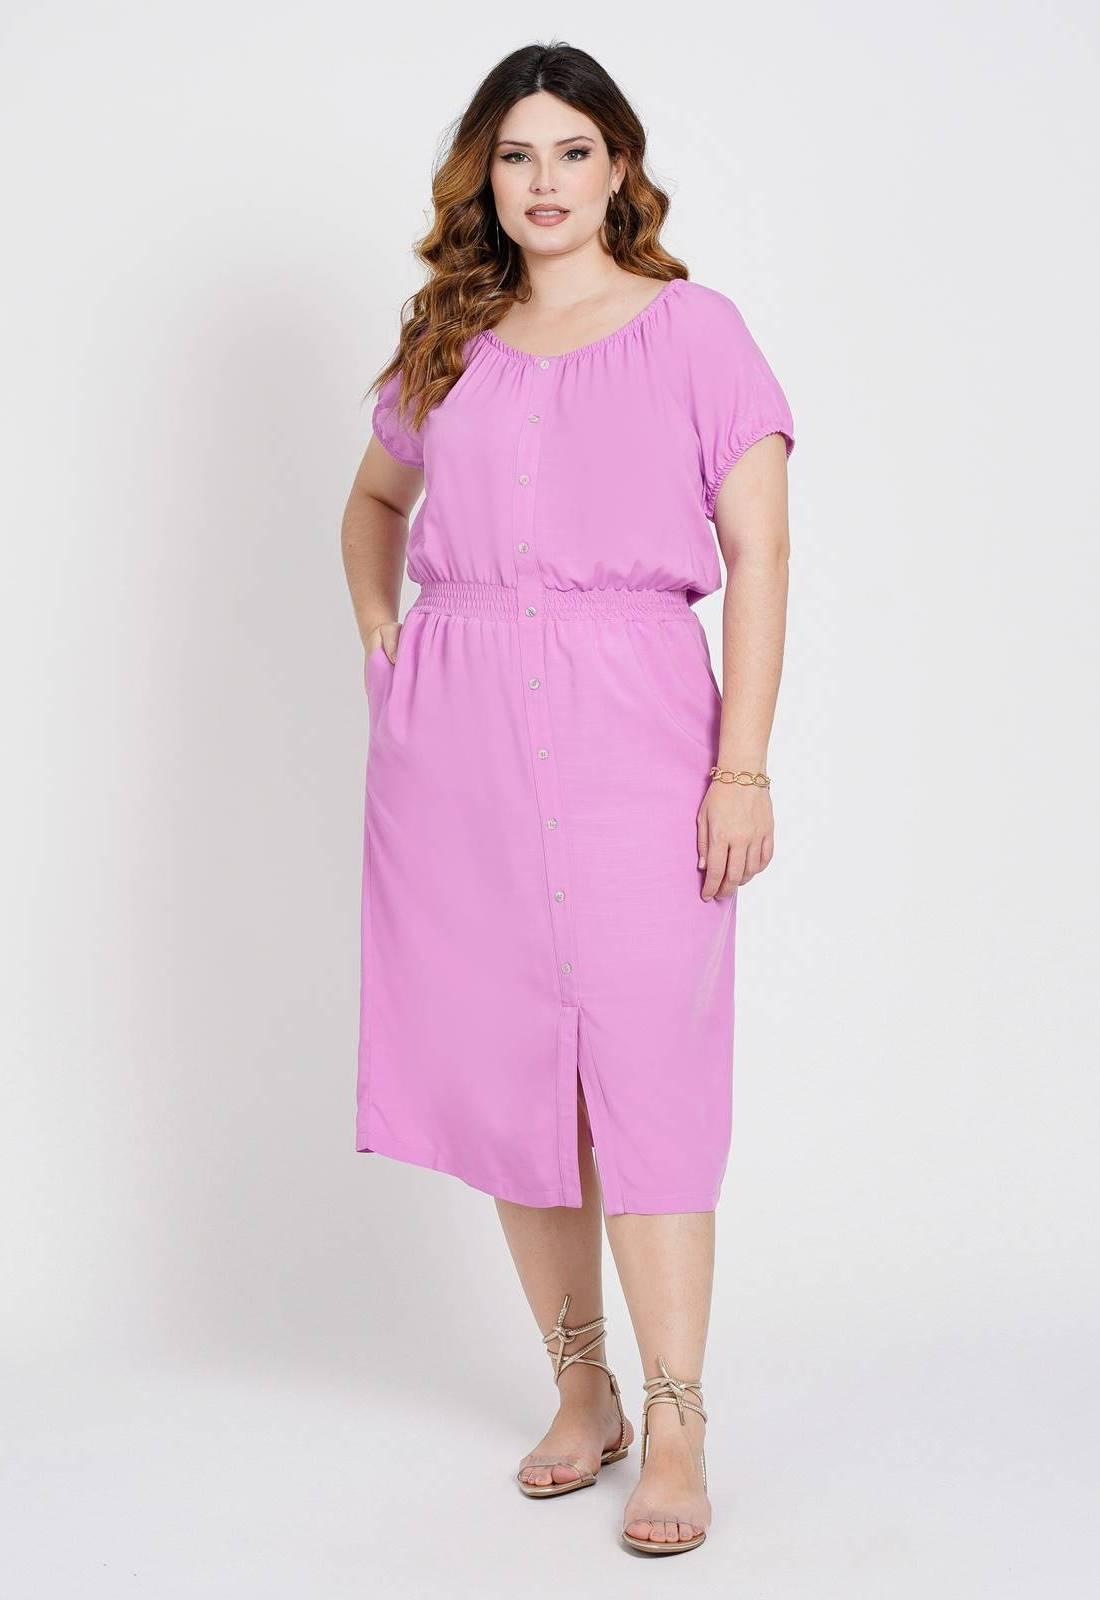 Vestido  midi com elastex Rosa  Ref. U79021